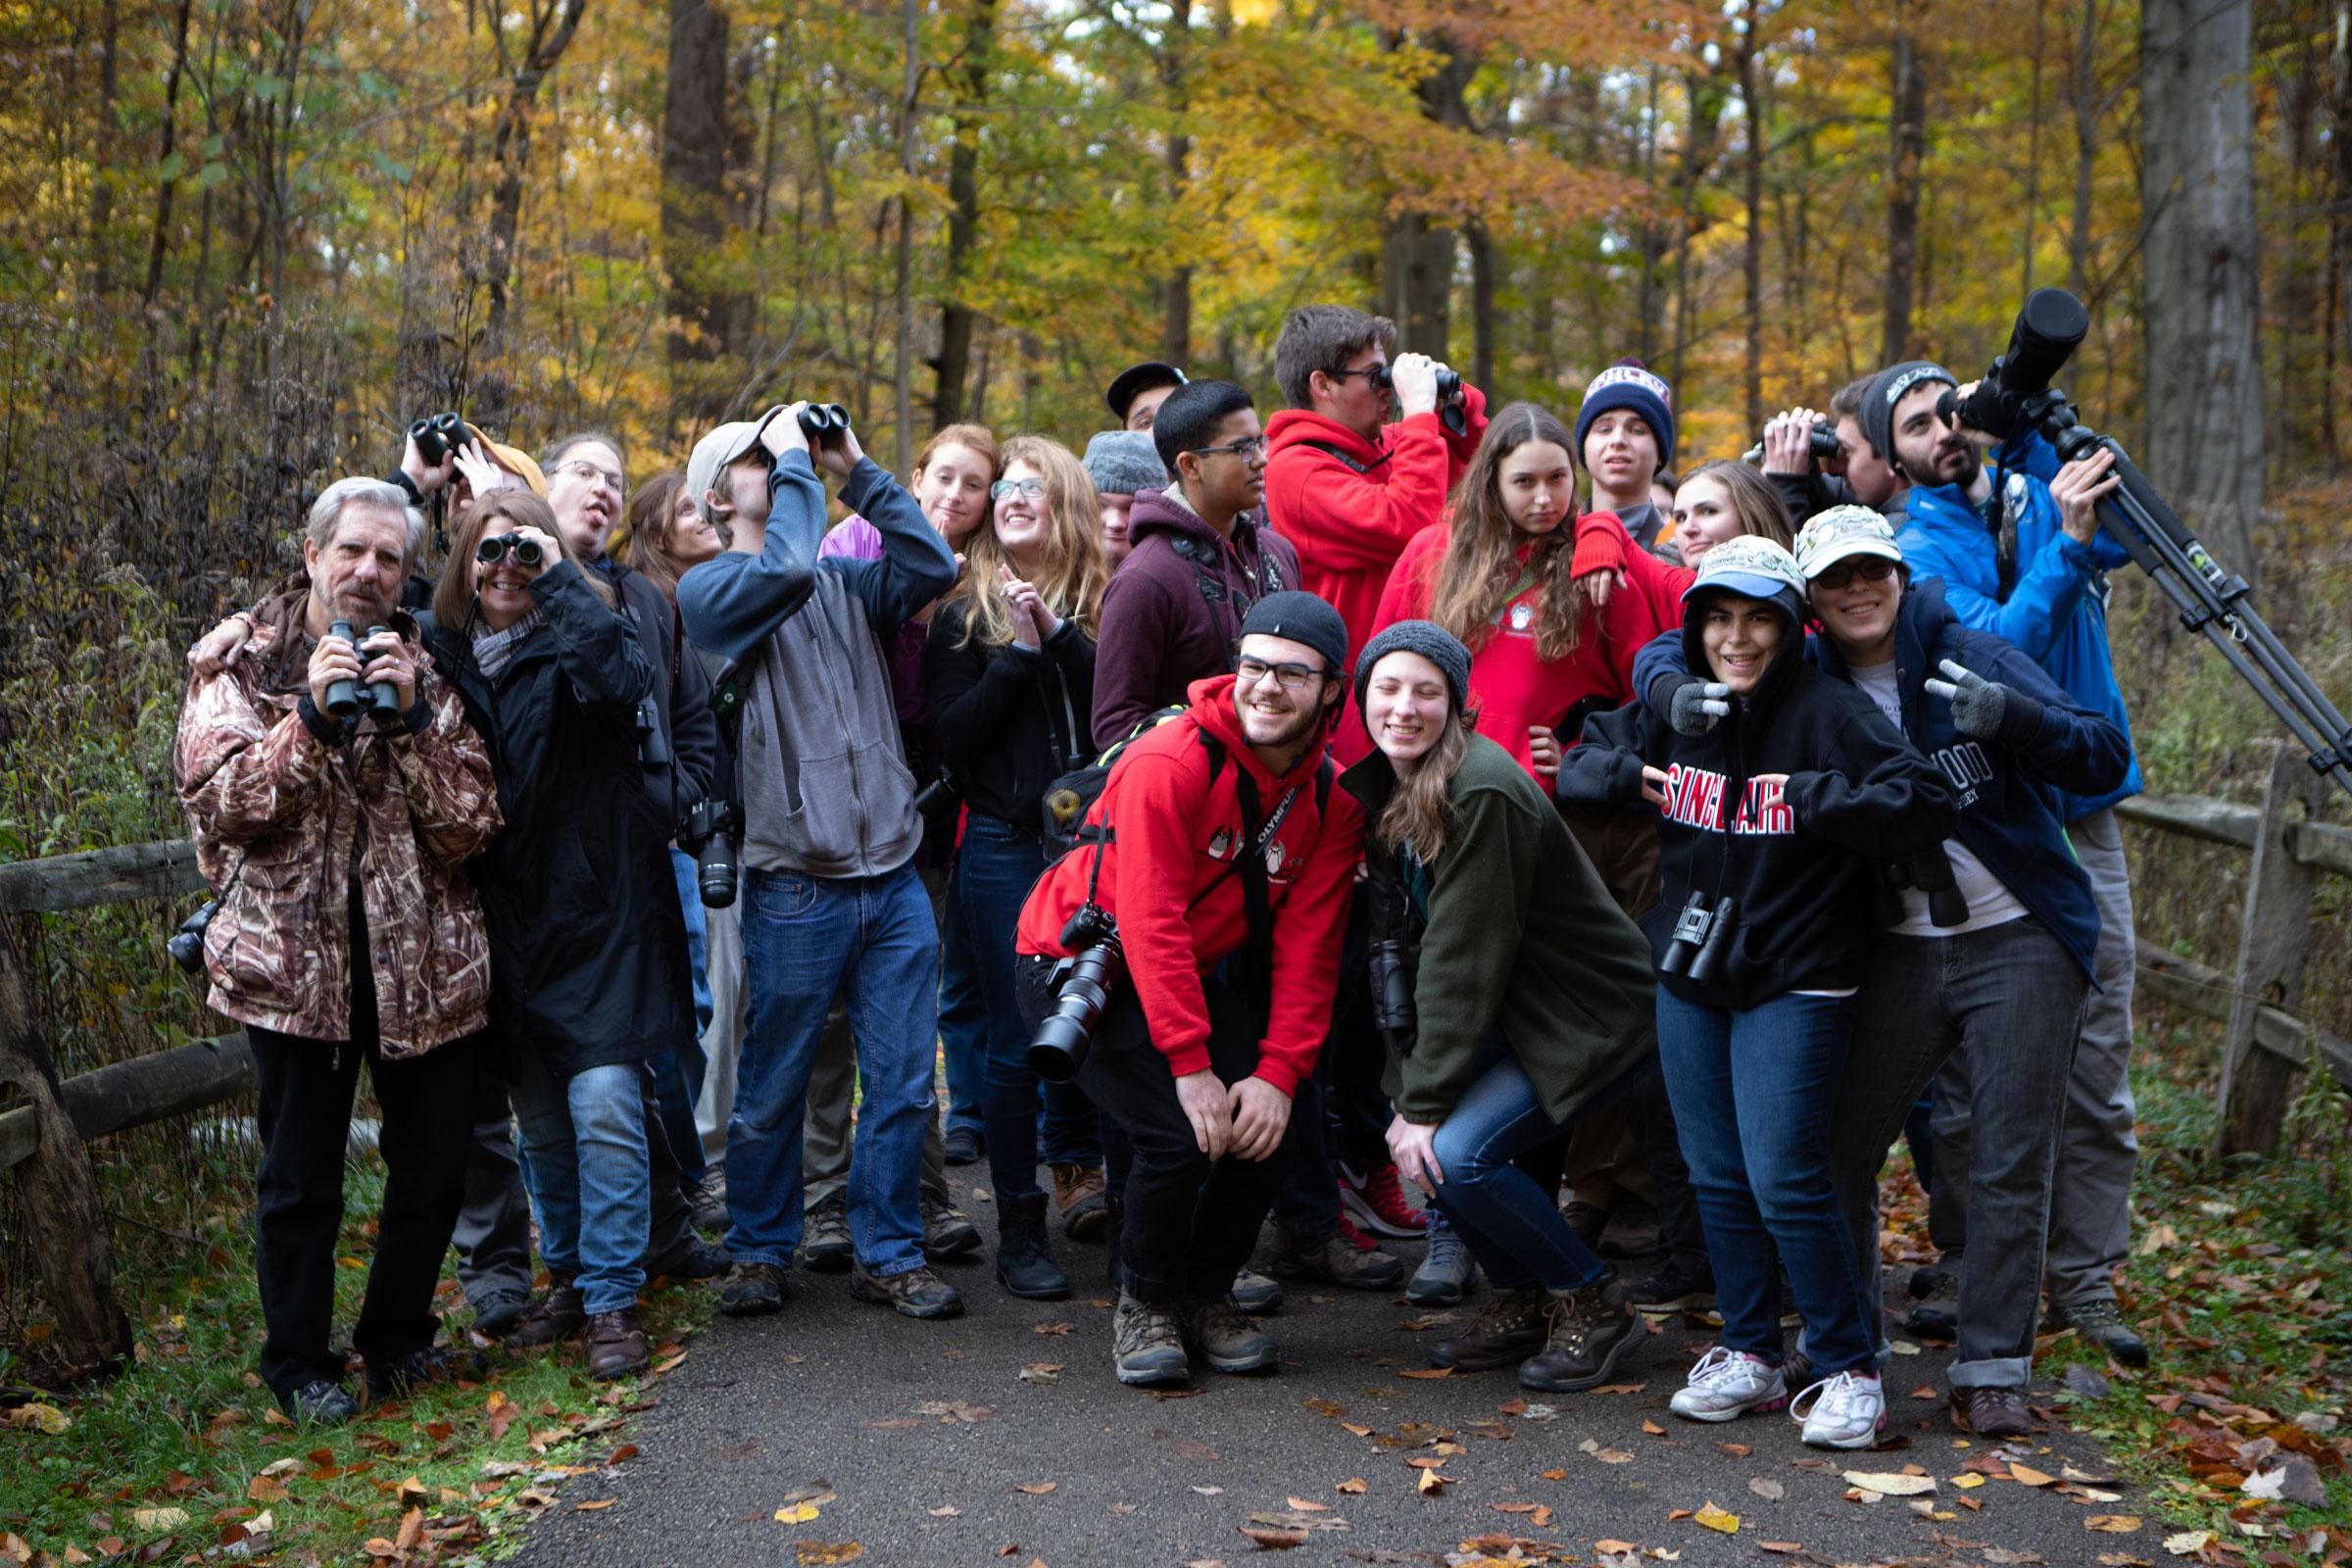 A class photo of current OYBC members with their mentors Kenn and Kimberly Kaufman (far left). Camilla Cerea/Audubon